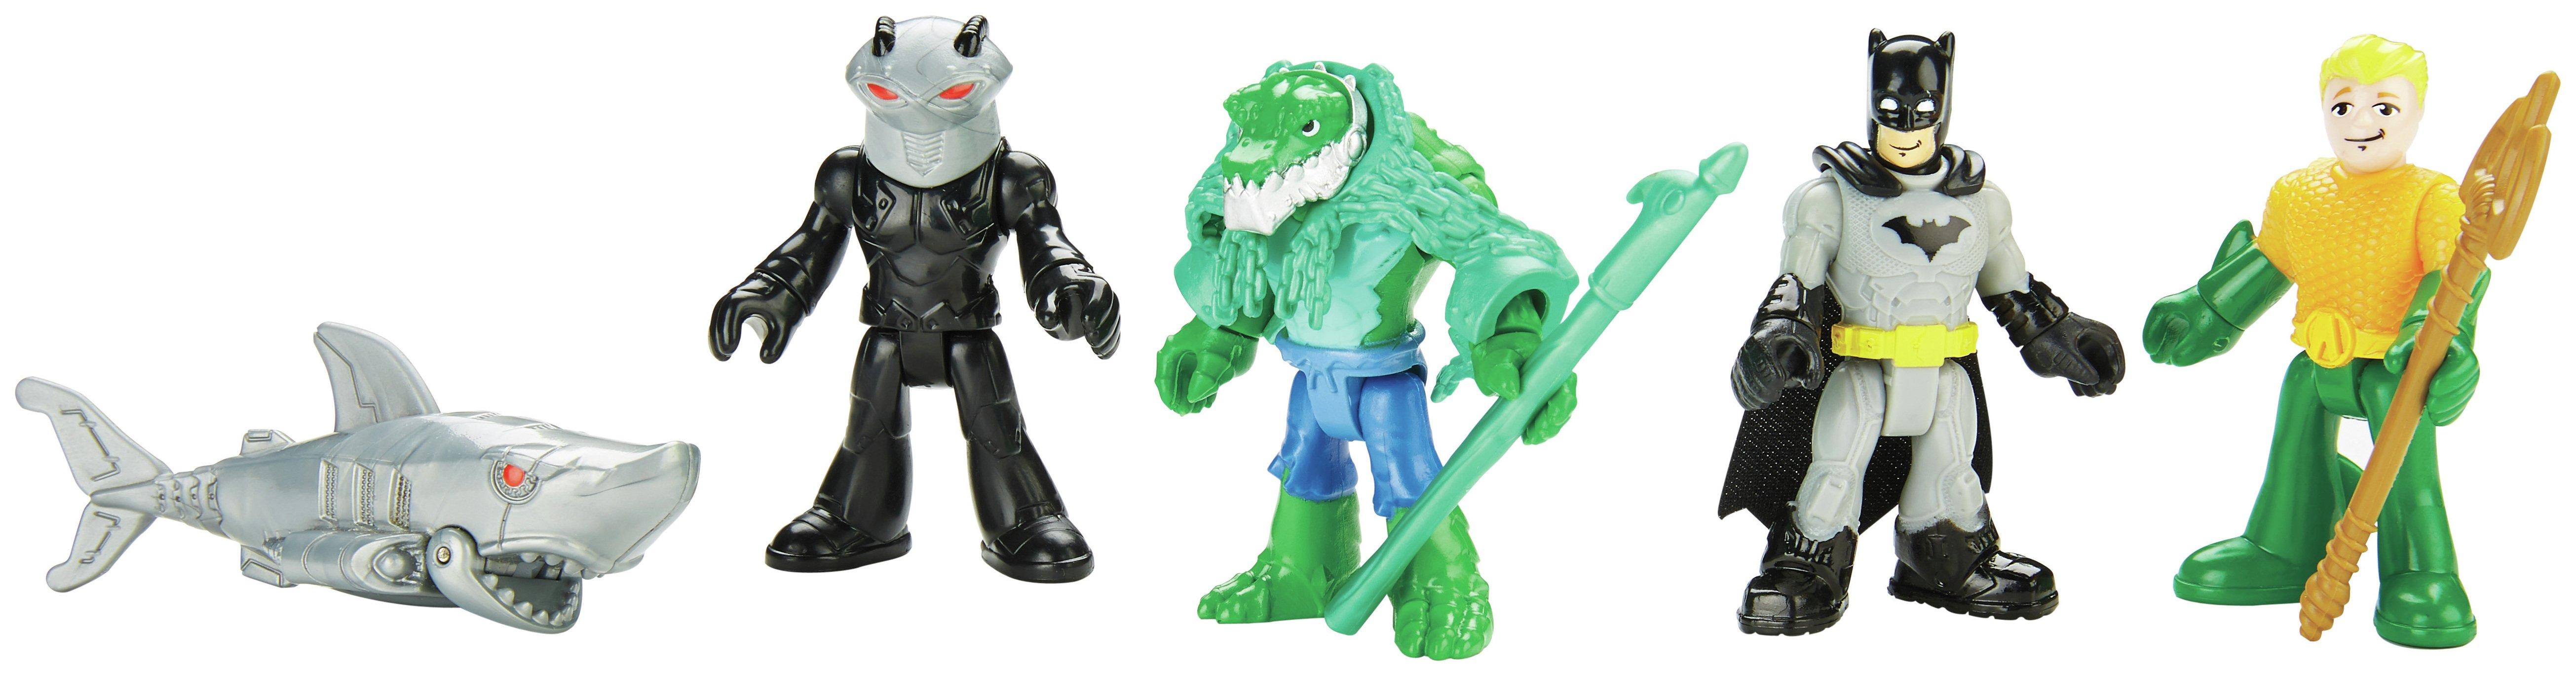 Image of Imaginext DC Super Friends Heroes & Villains Assortment